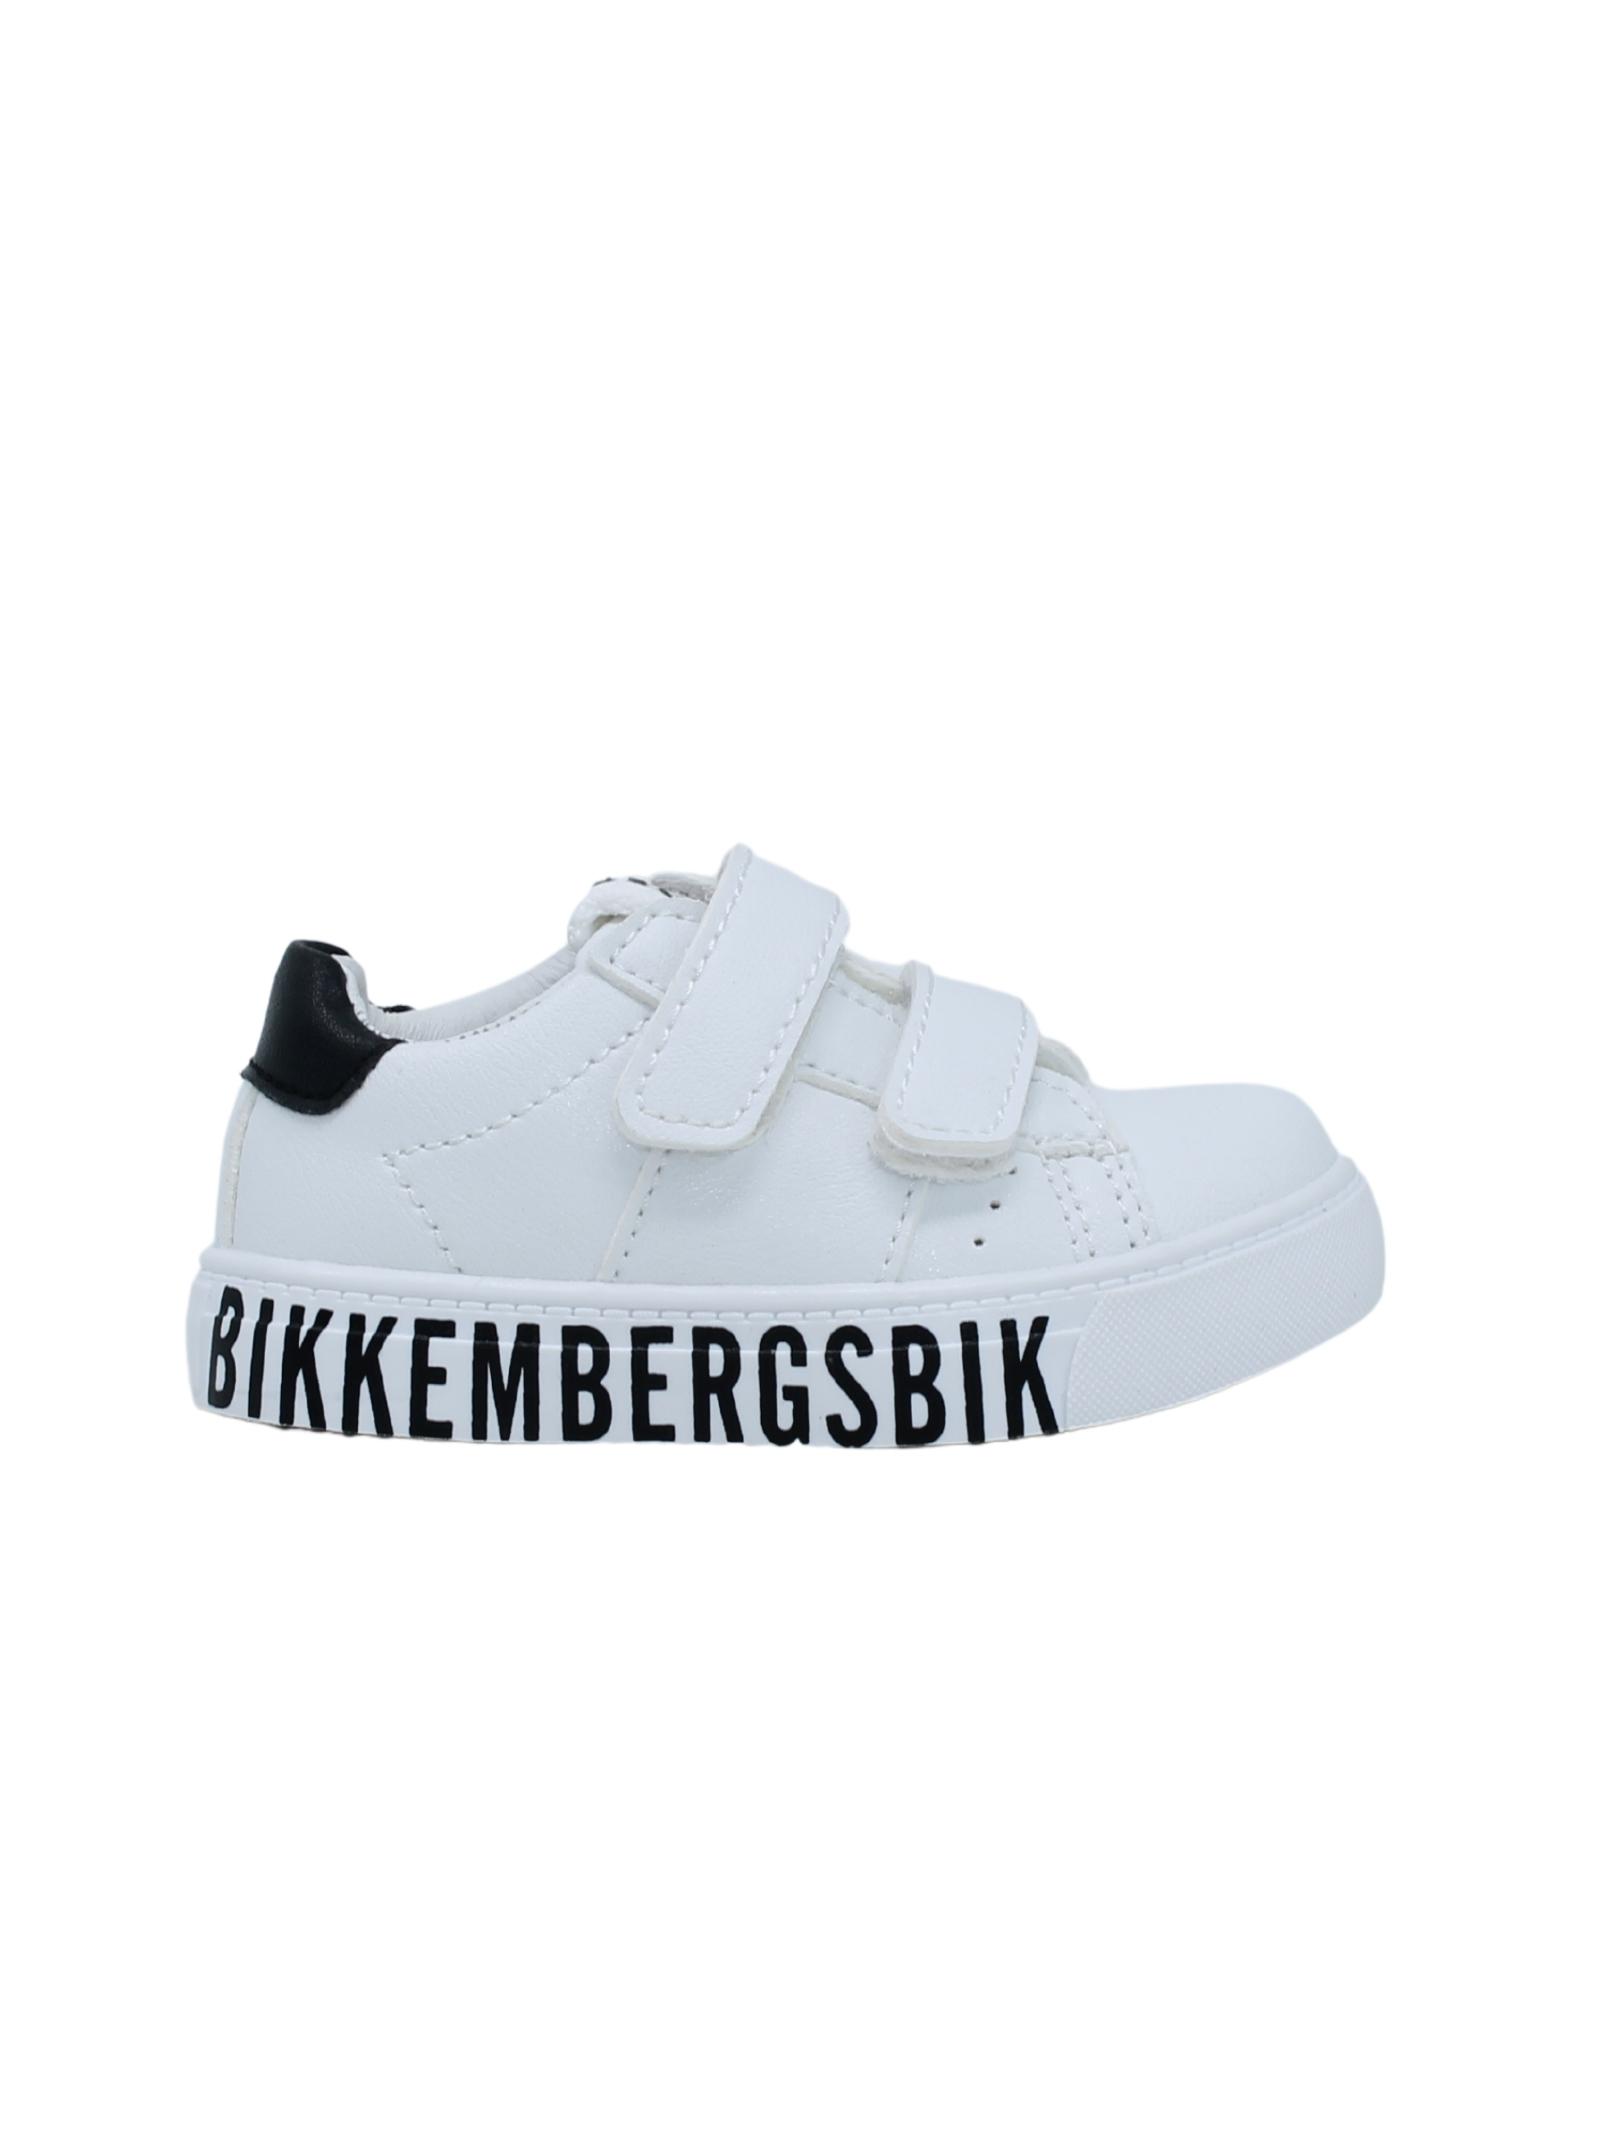 BIKKEMBERGS KIDS | Sneakers | K1B4205100193X002BIANCO